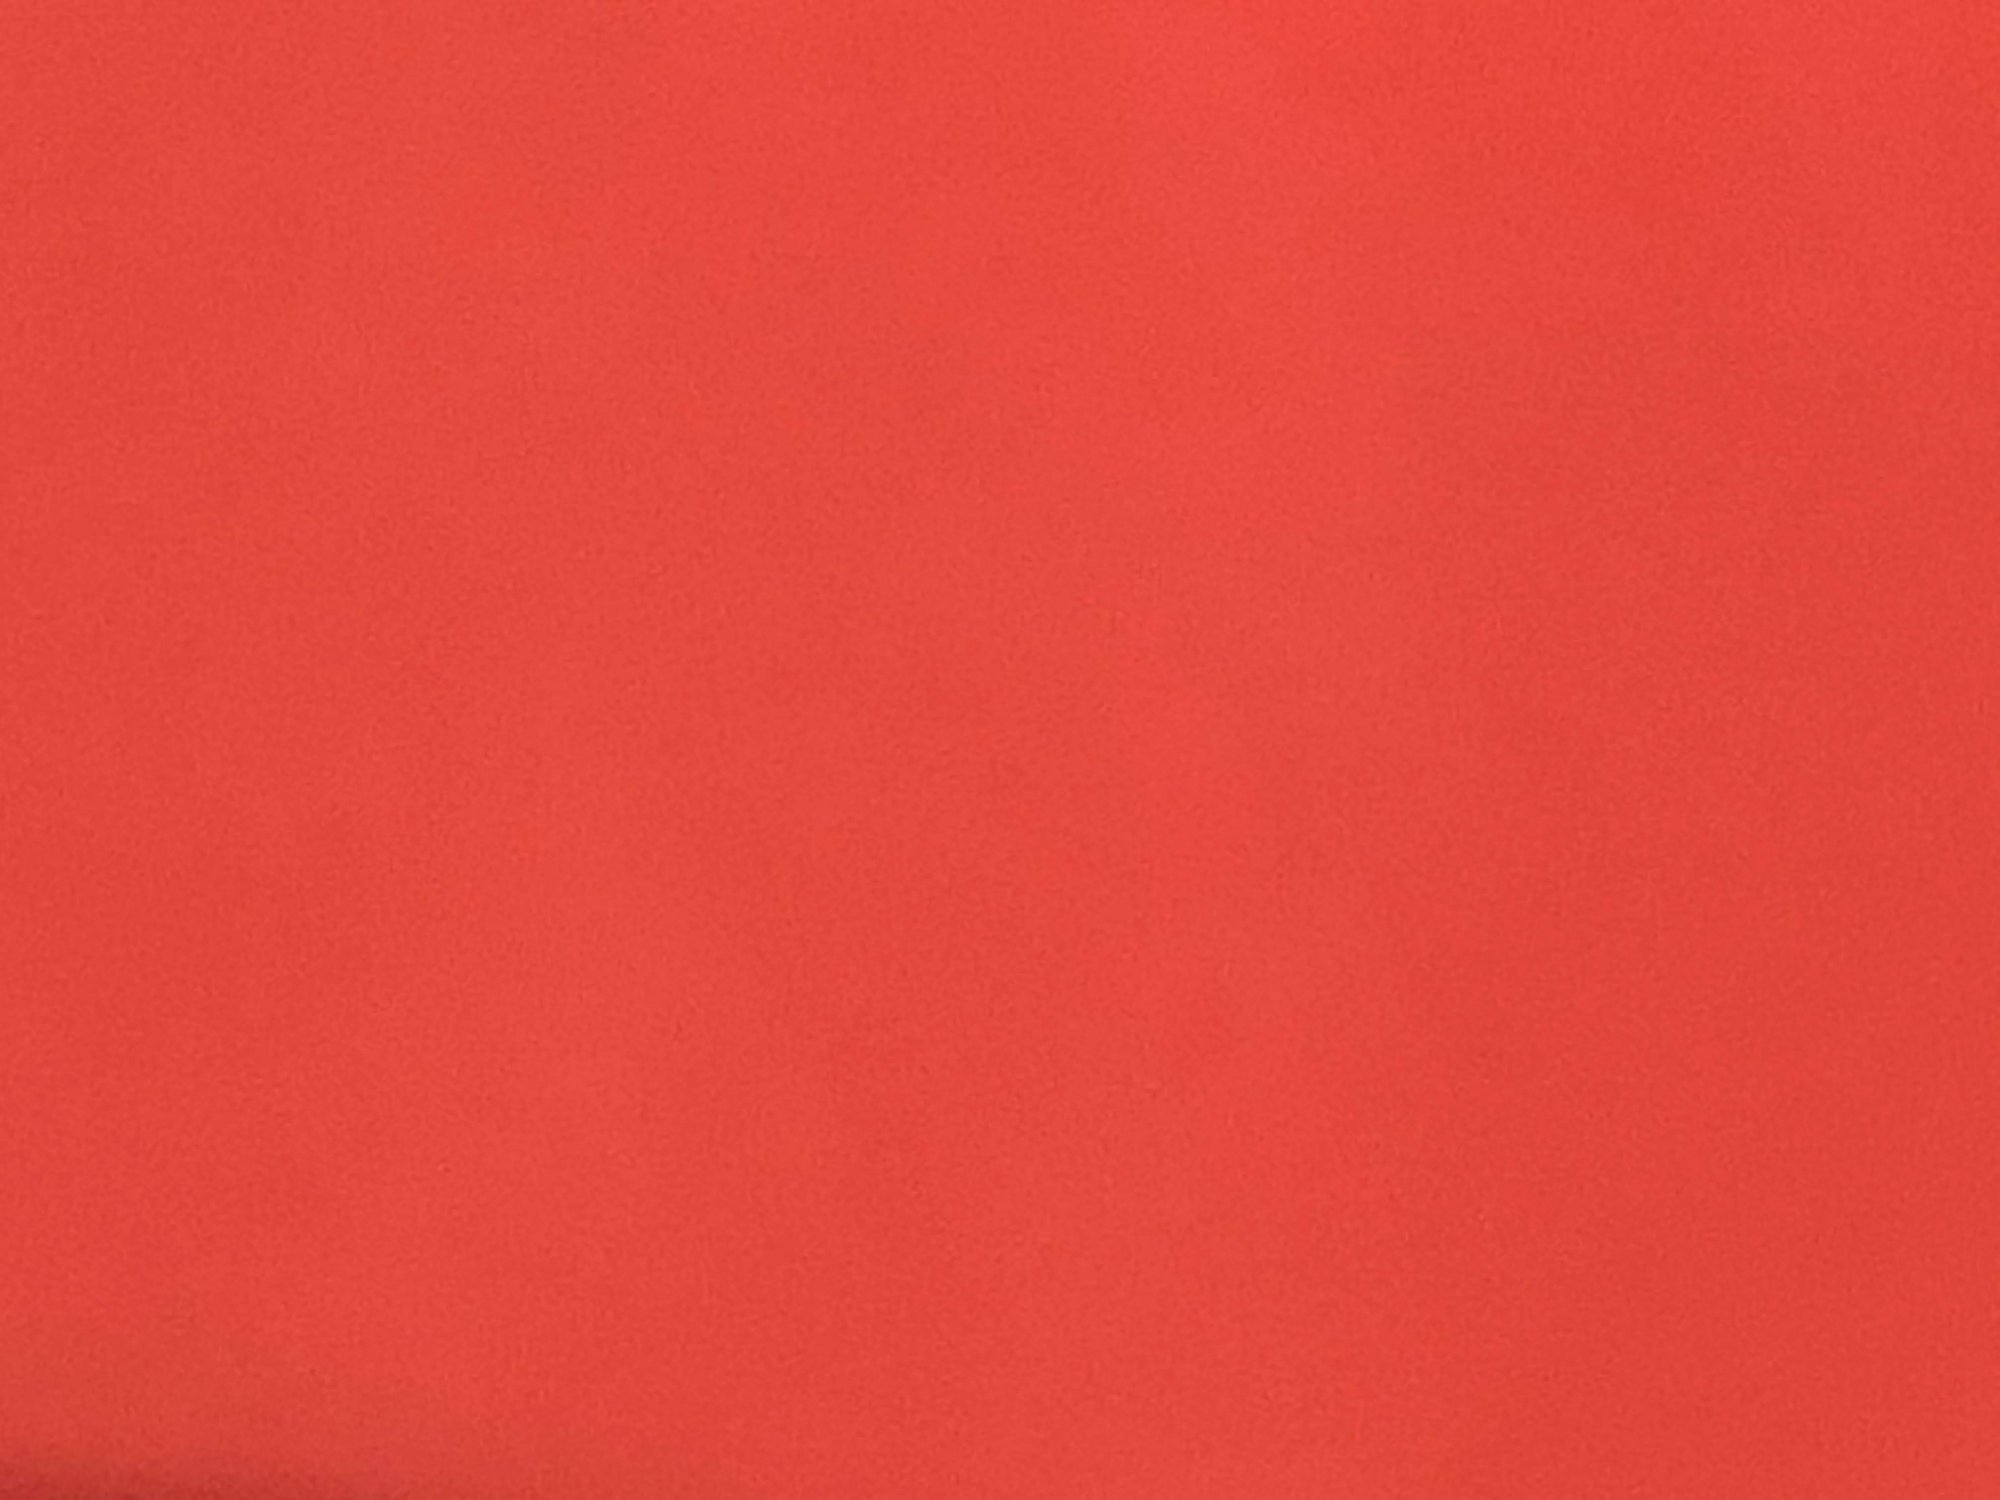 Stahls' Coral Fashion-Film Heat Transfer Vinyl 12 x 15